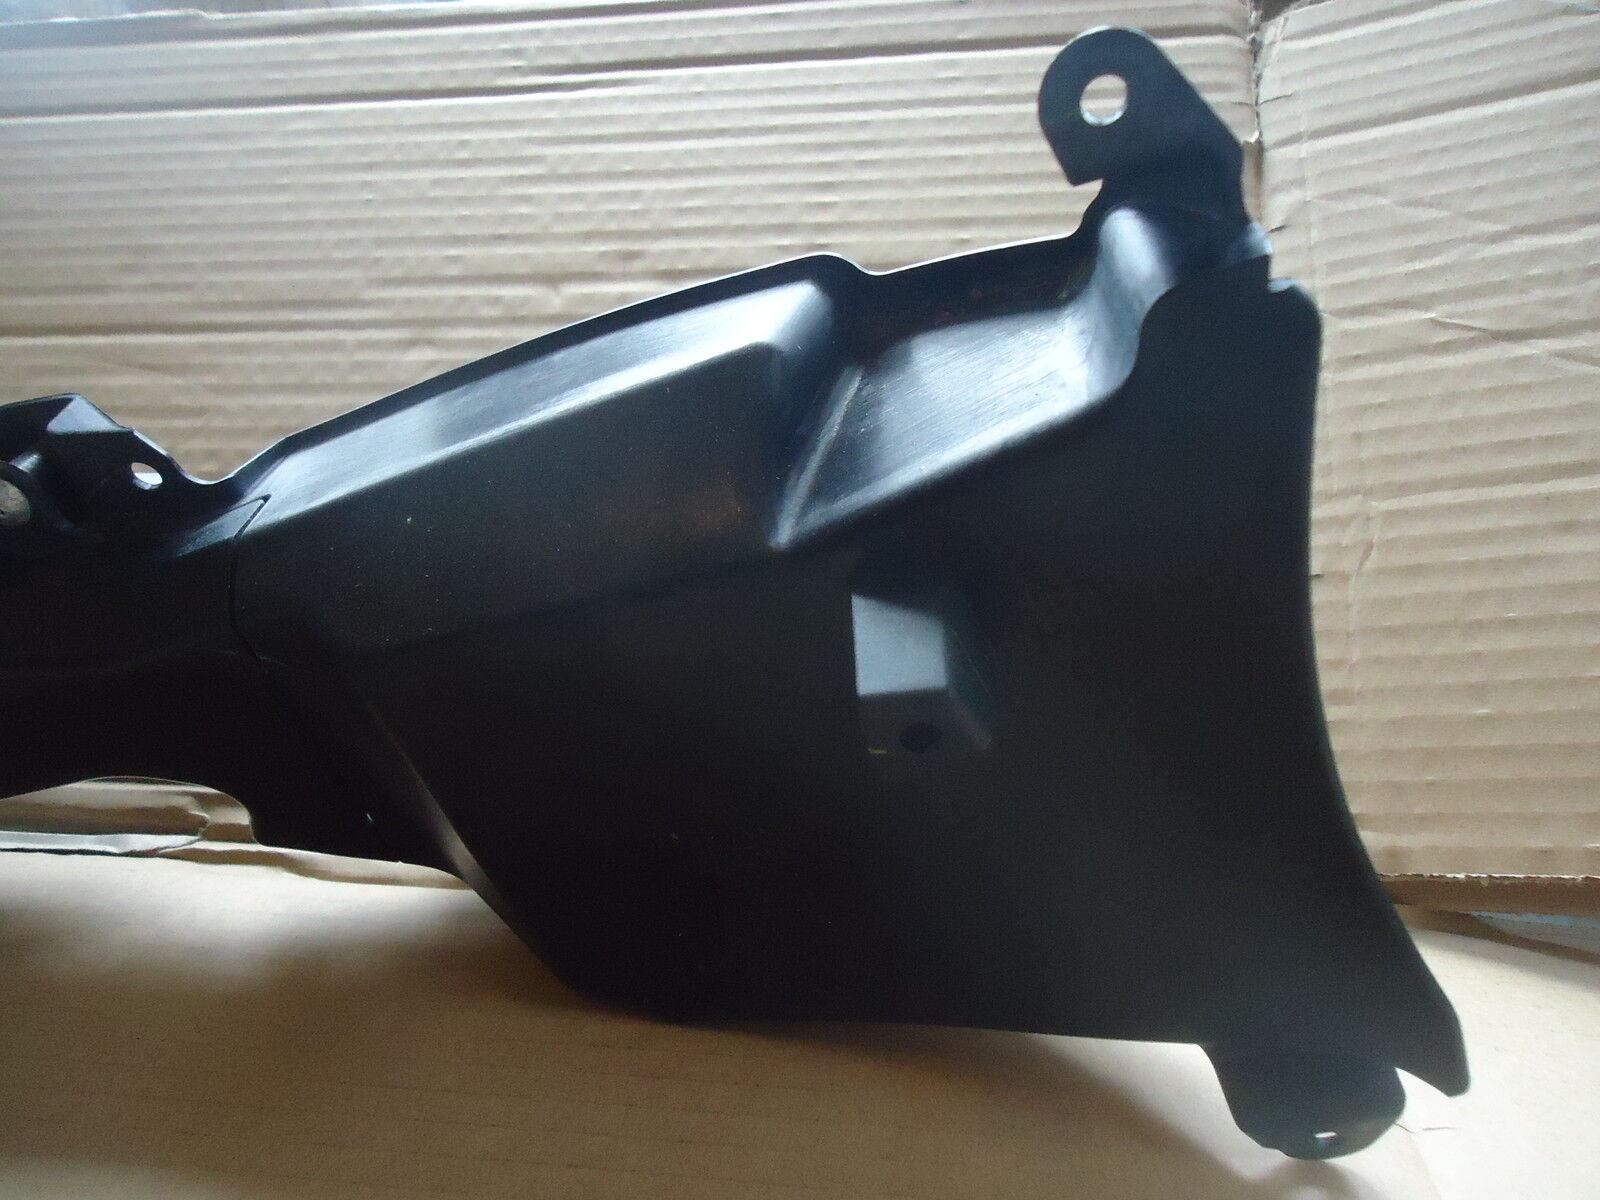 Yamaha Yzf-R6 Yamaha 08-10 R6r Right Ram Air Cover Fairing Plastic Dash Duct Tu